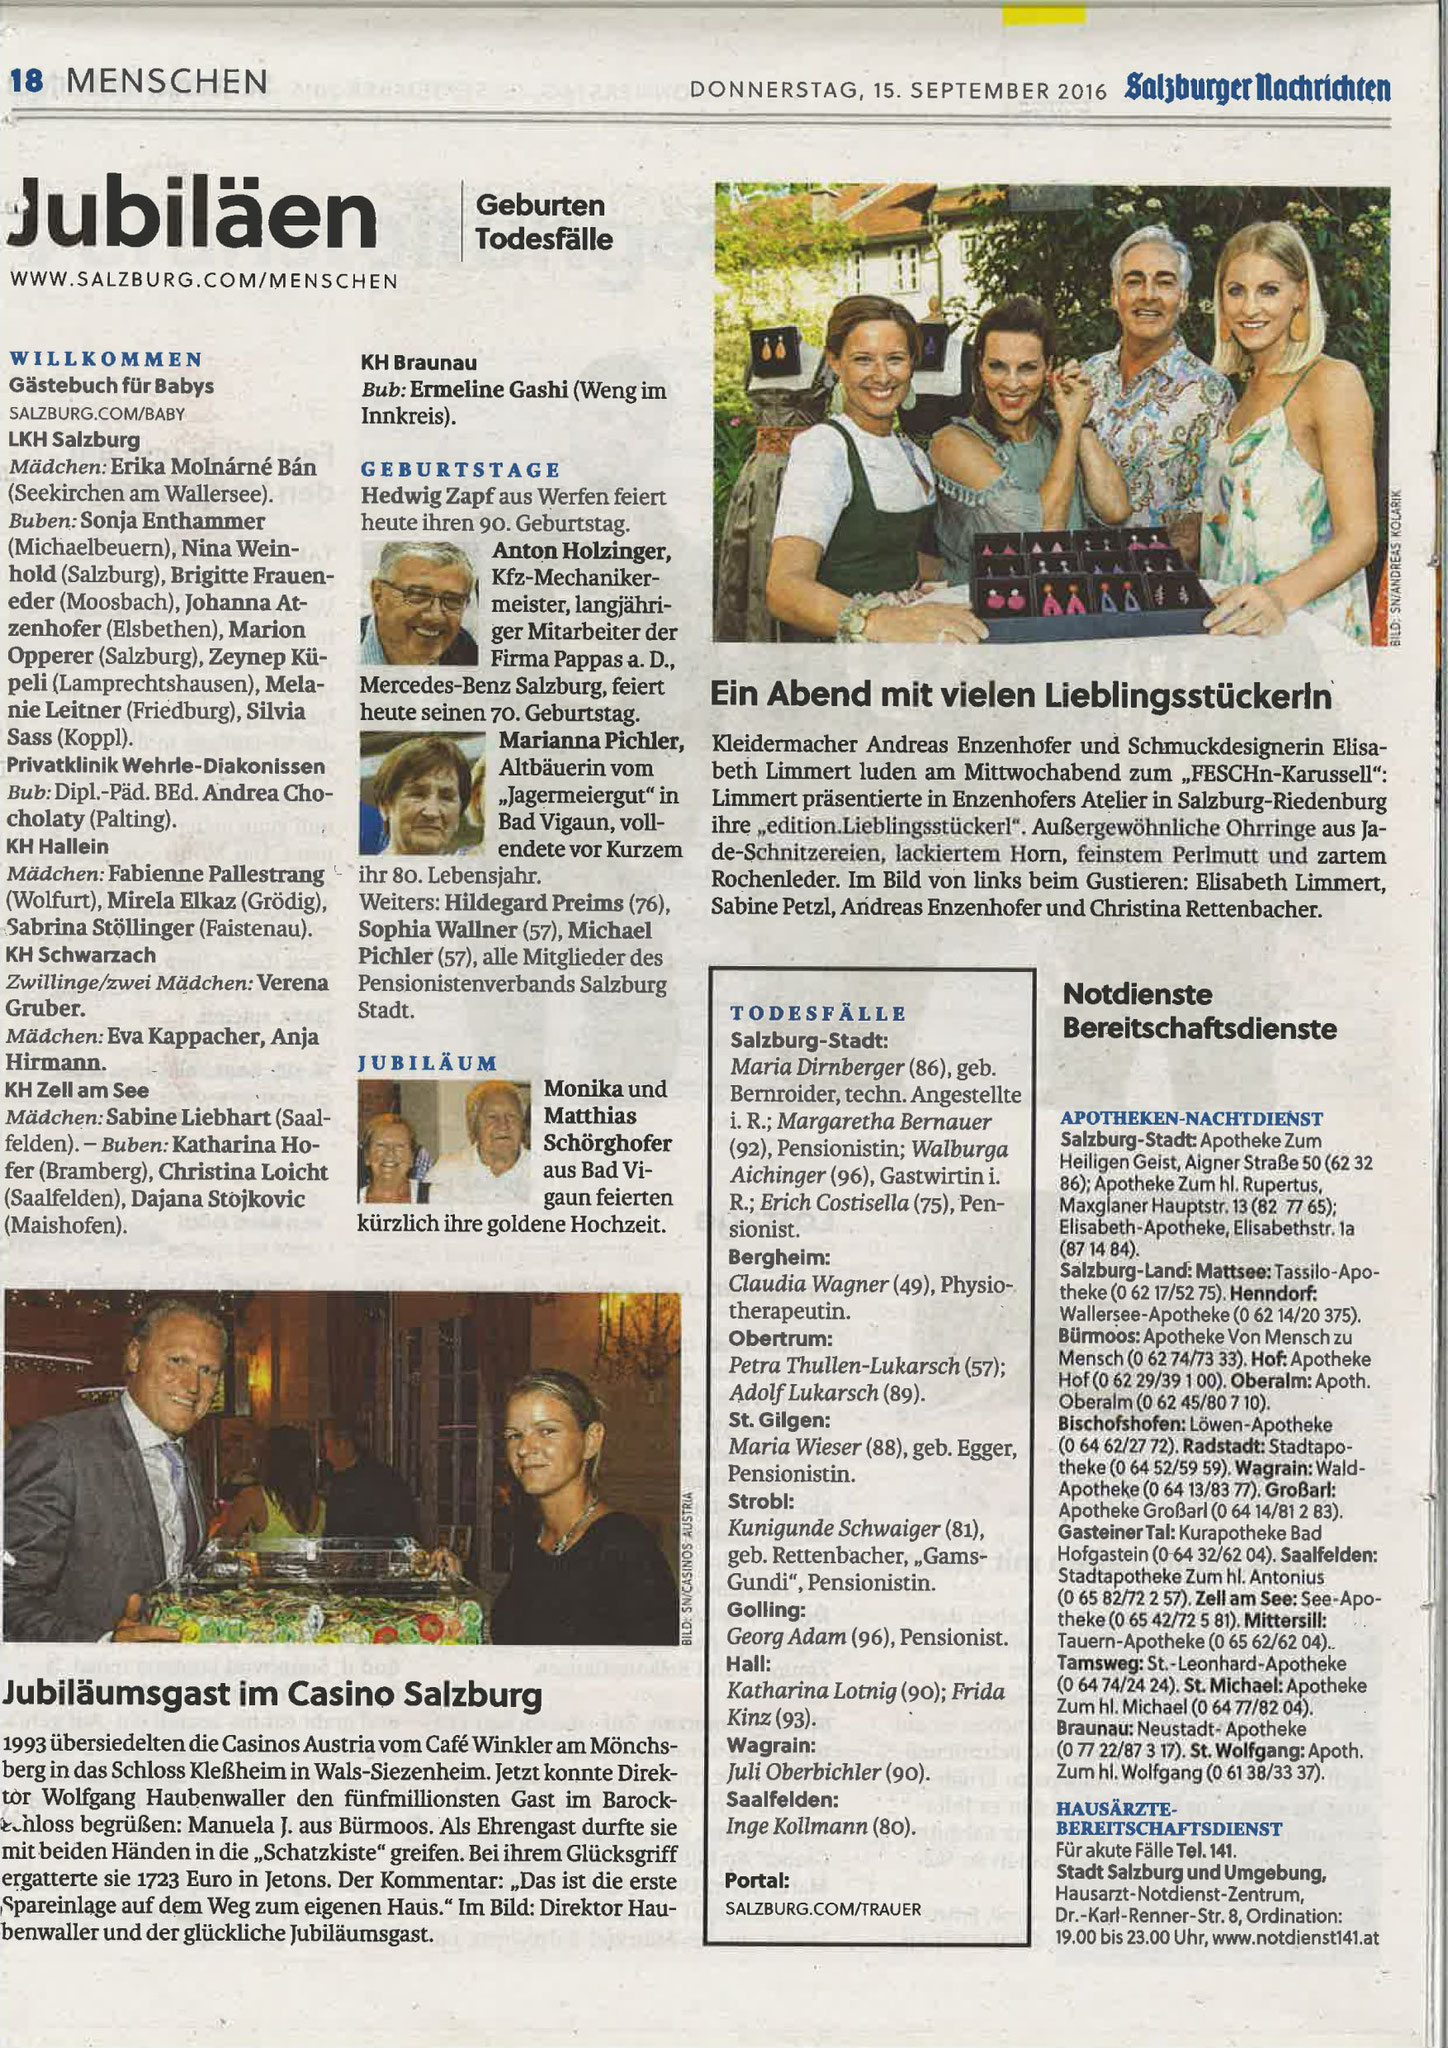 Salzburger Nachrichten, 15. September 2016